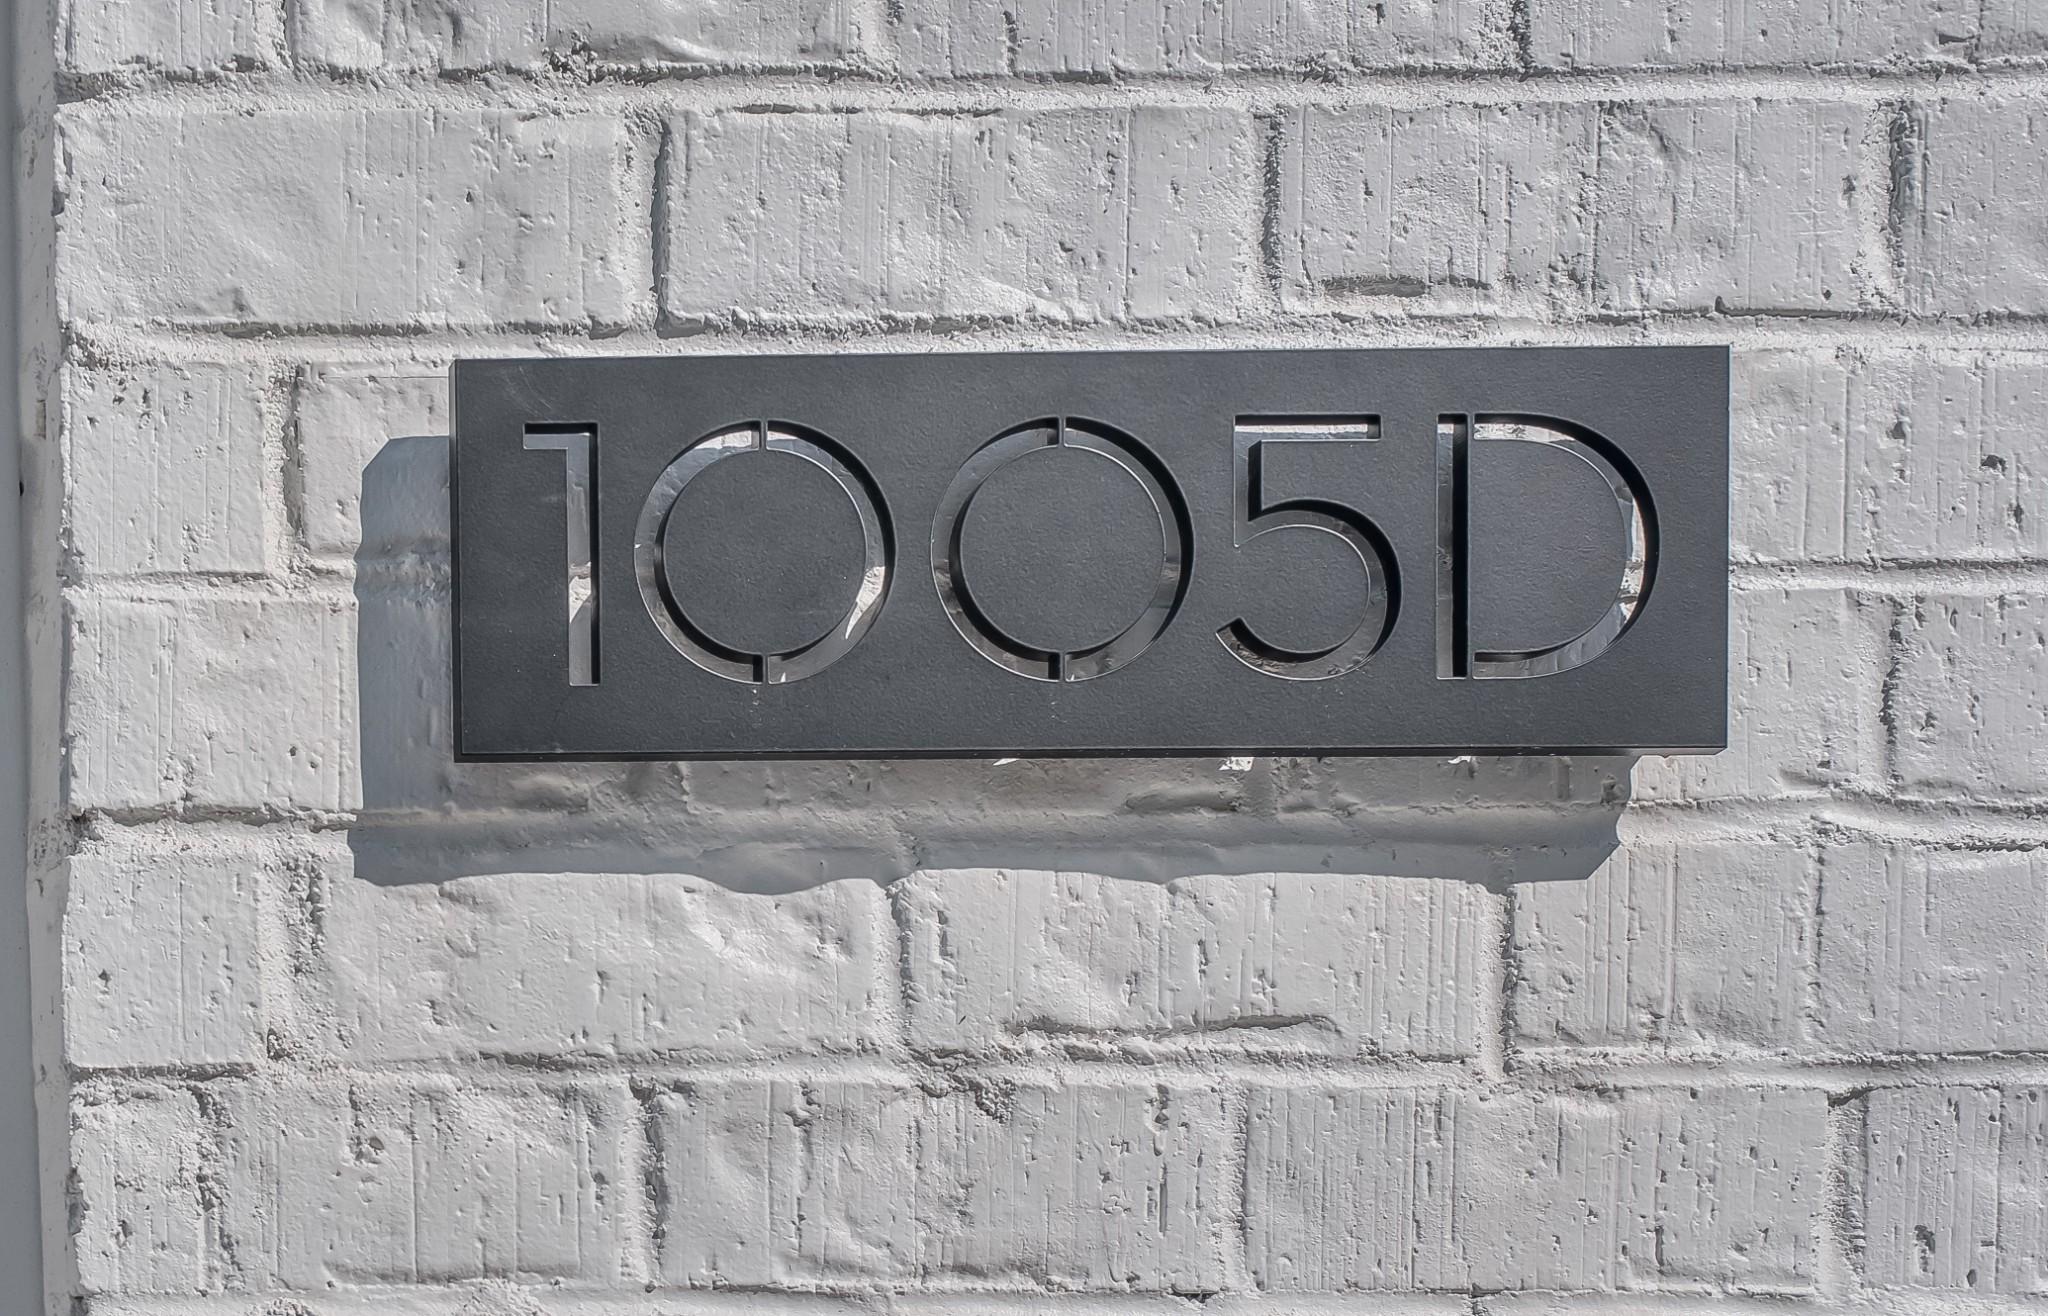 1005 12th Ave S #D Property Photo - Nashville, TN real estate listing